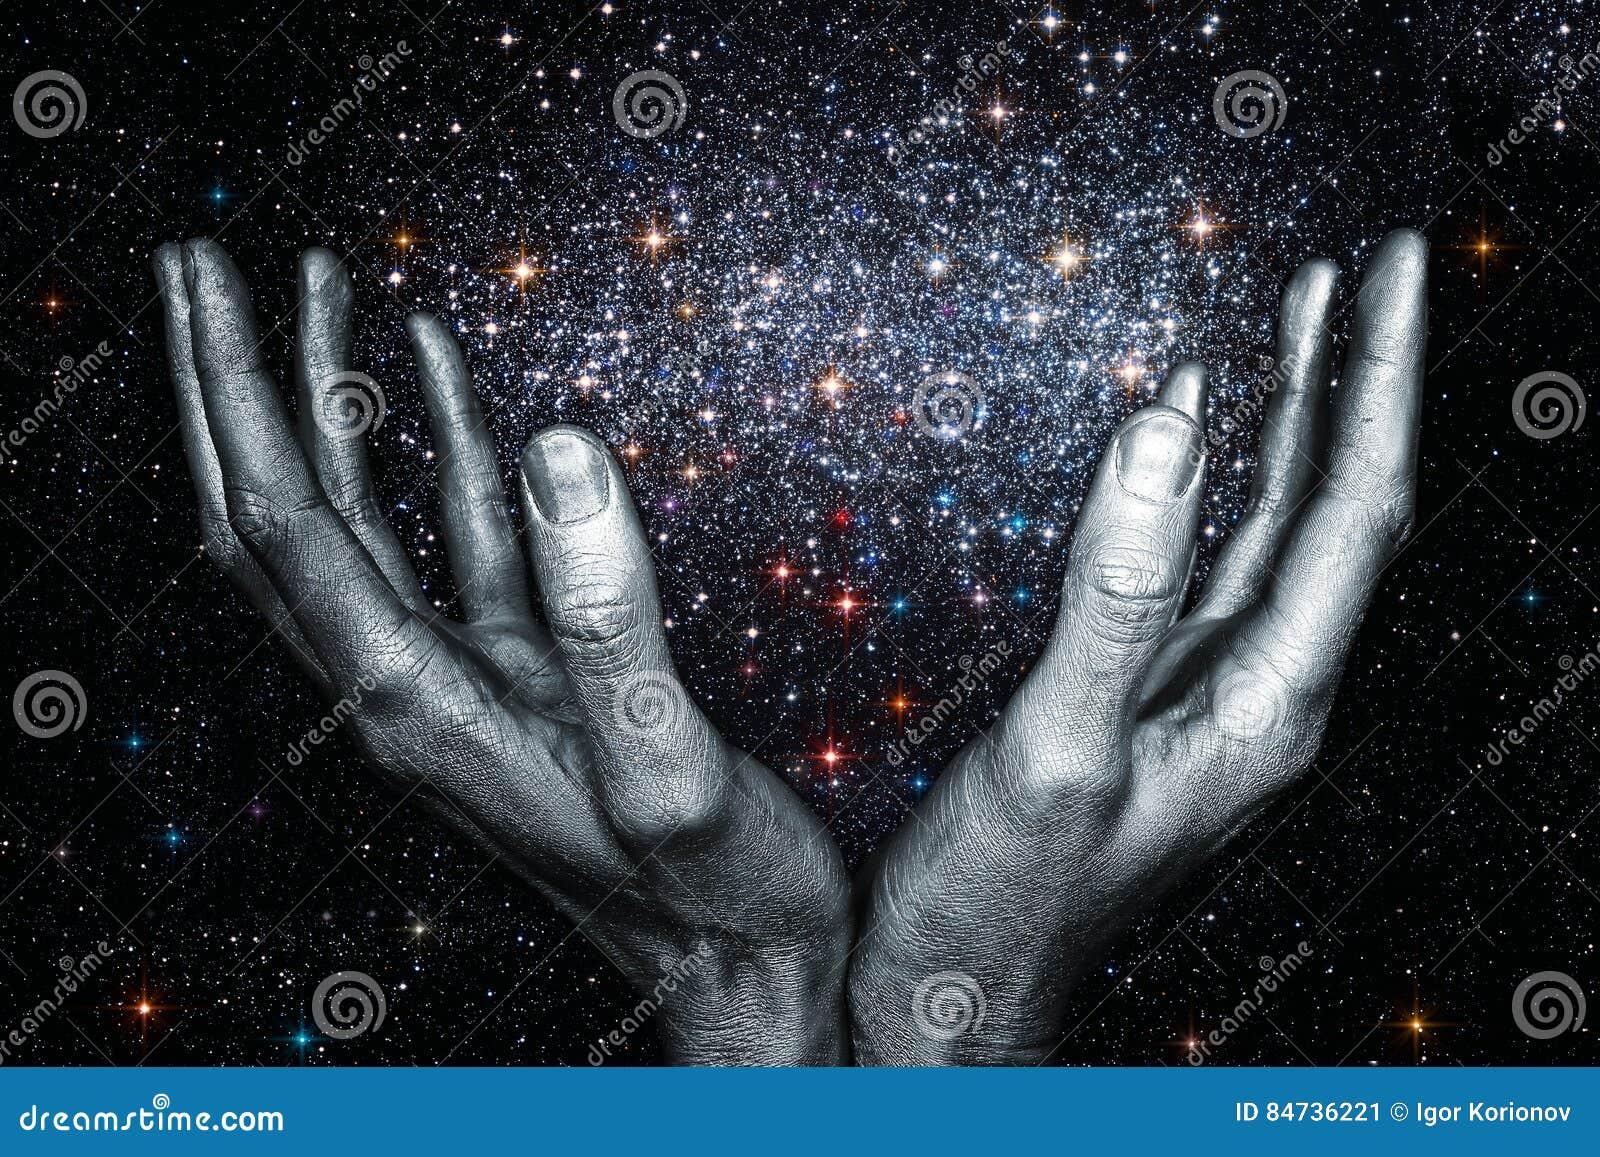 God hands holding a star galaxy